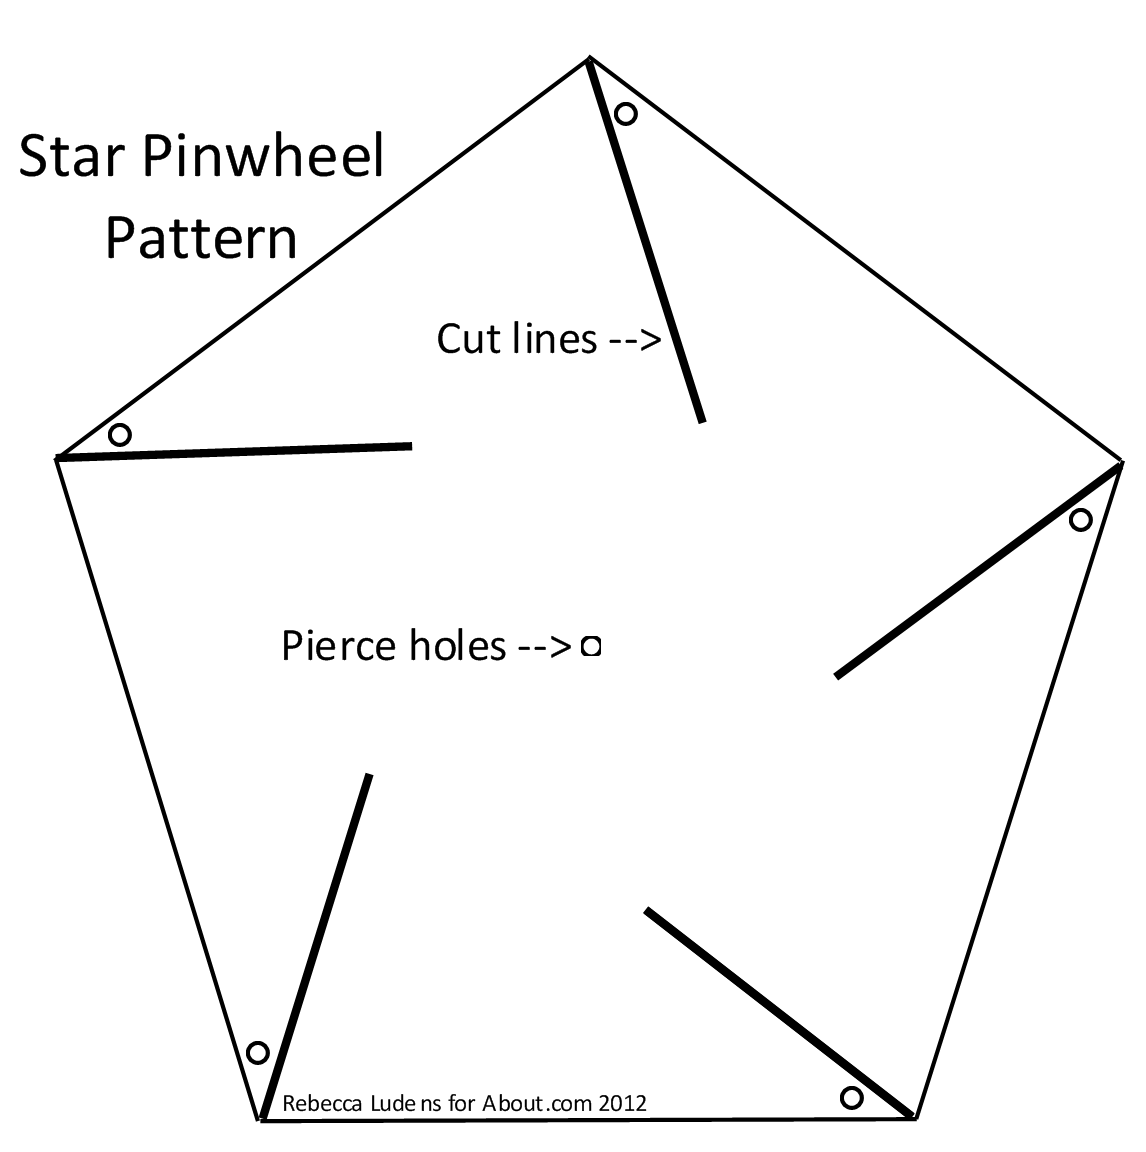 Star Pinwheel Pattern | Art and crafts | Pinterest